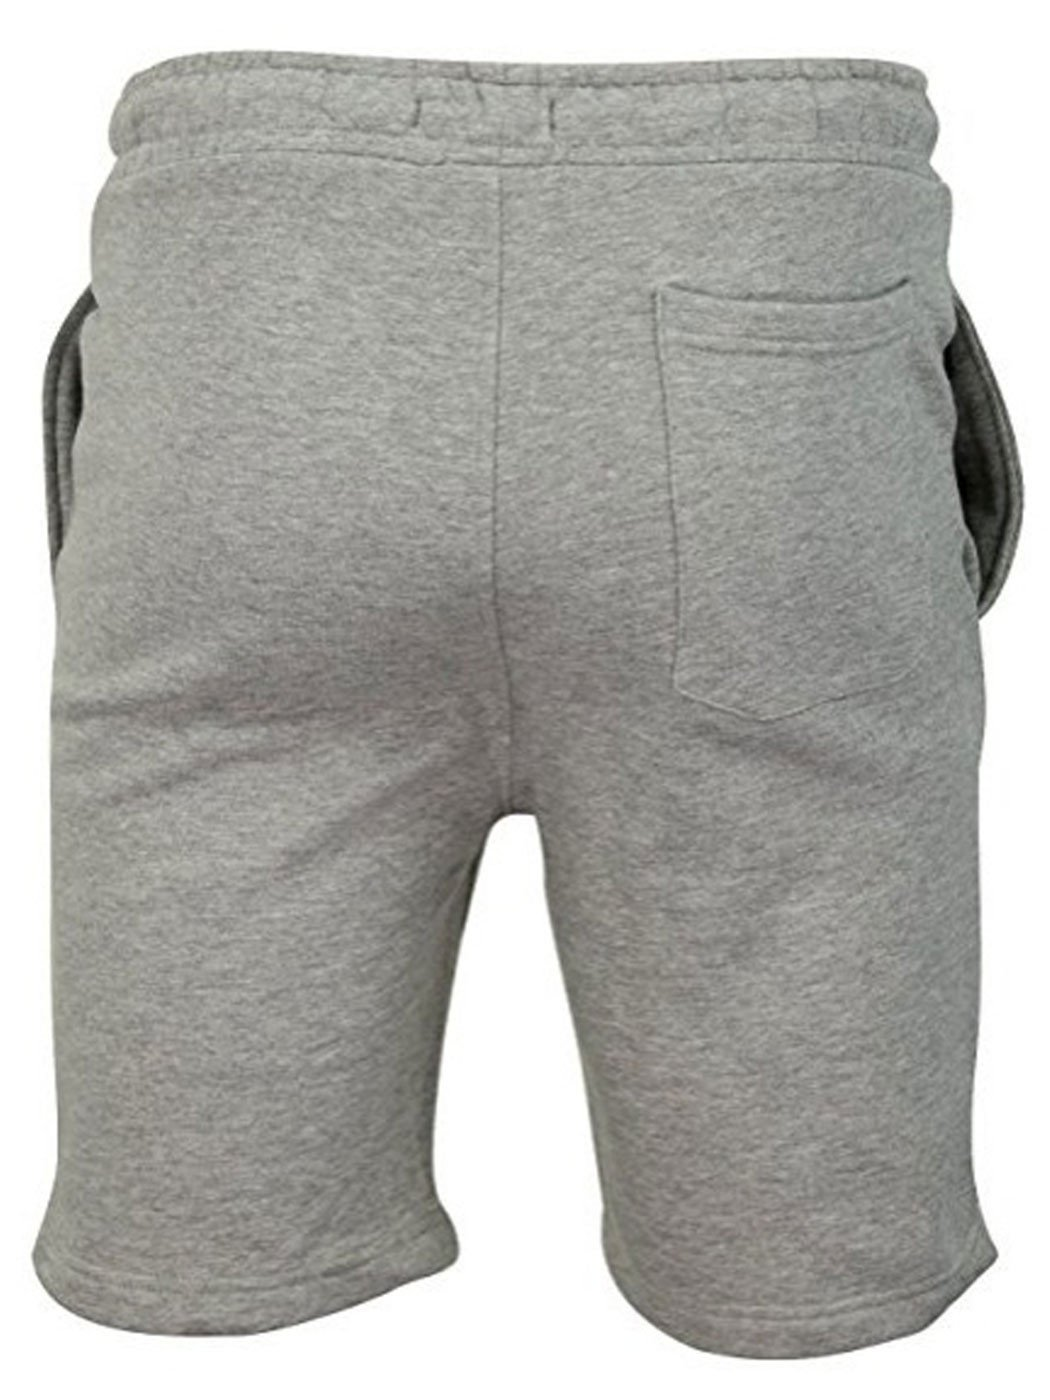 Mens-Brave-Soul-Shorts-Jogging-Fleece-Training-Running-Gym-Sport-Pique-Cotton-M thumbnail 19